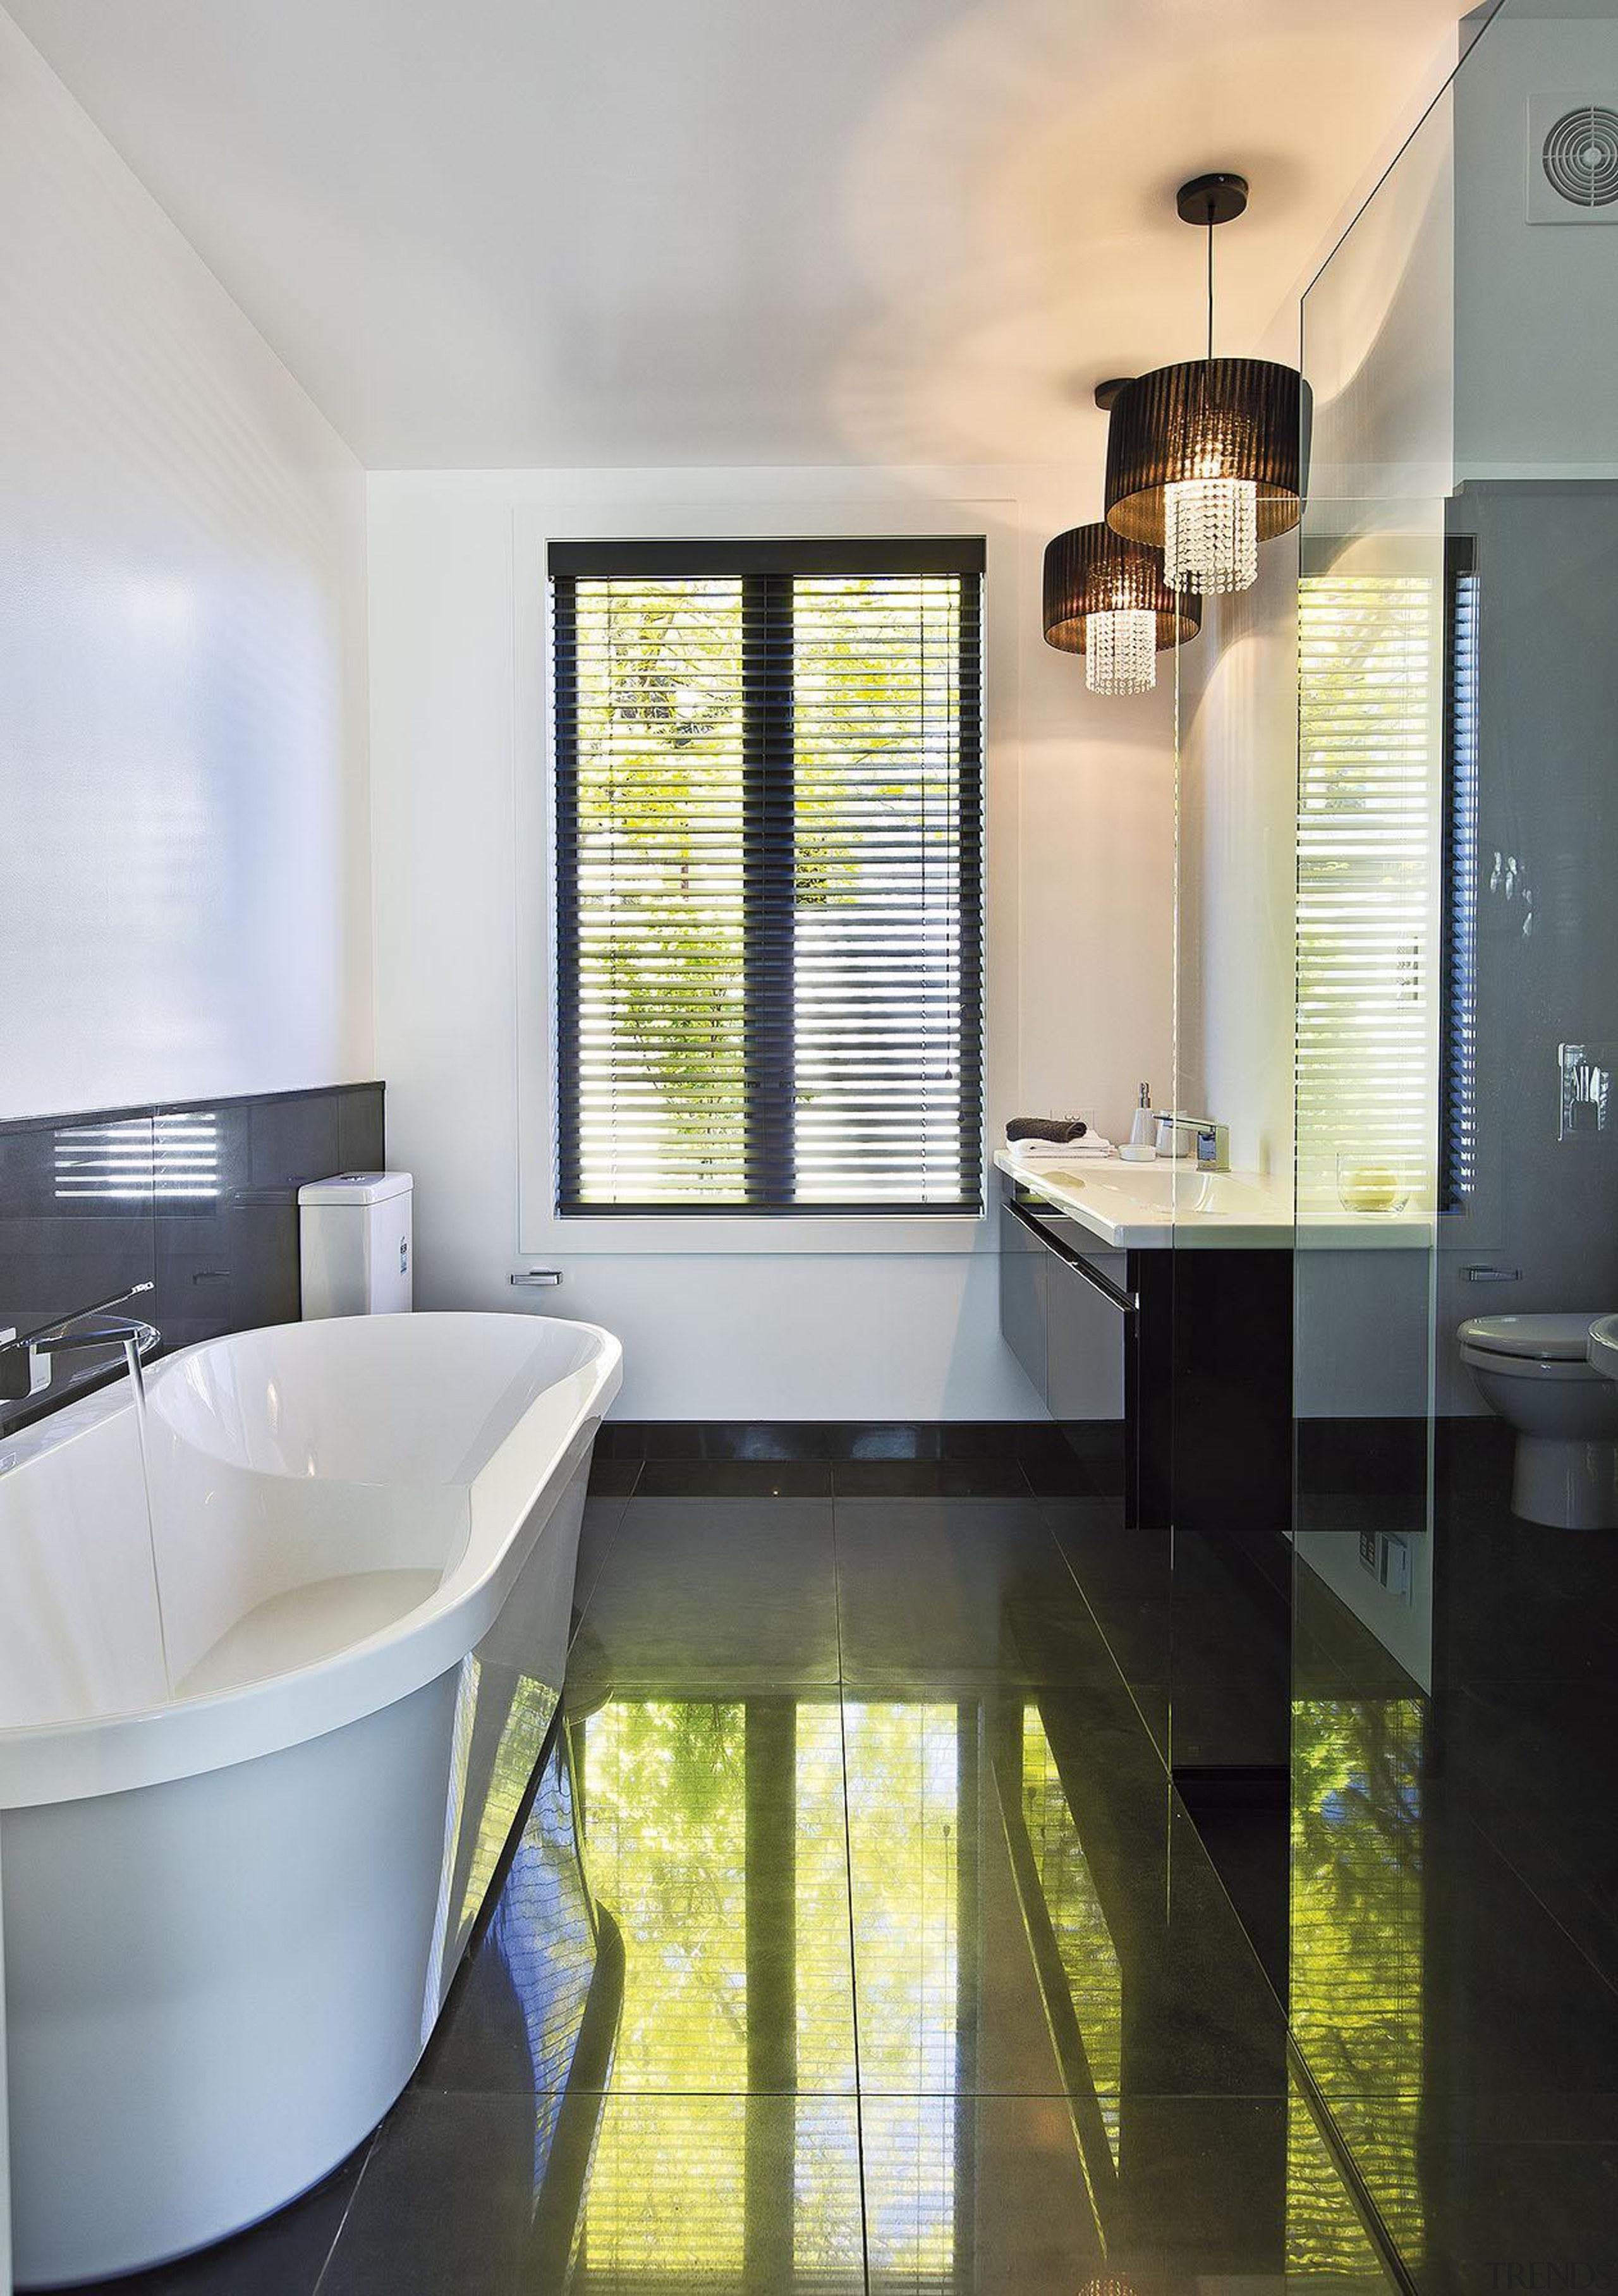 For more information, please visit www.gjgardner.co.nz architecture, bathroom, floor, interior design, real estate, room, gray